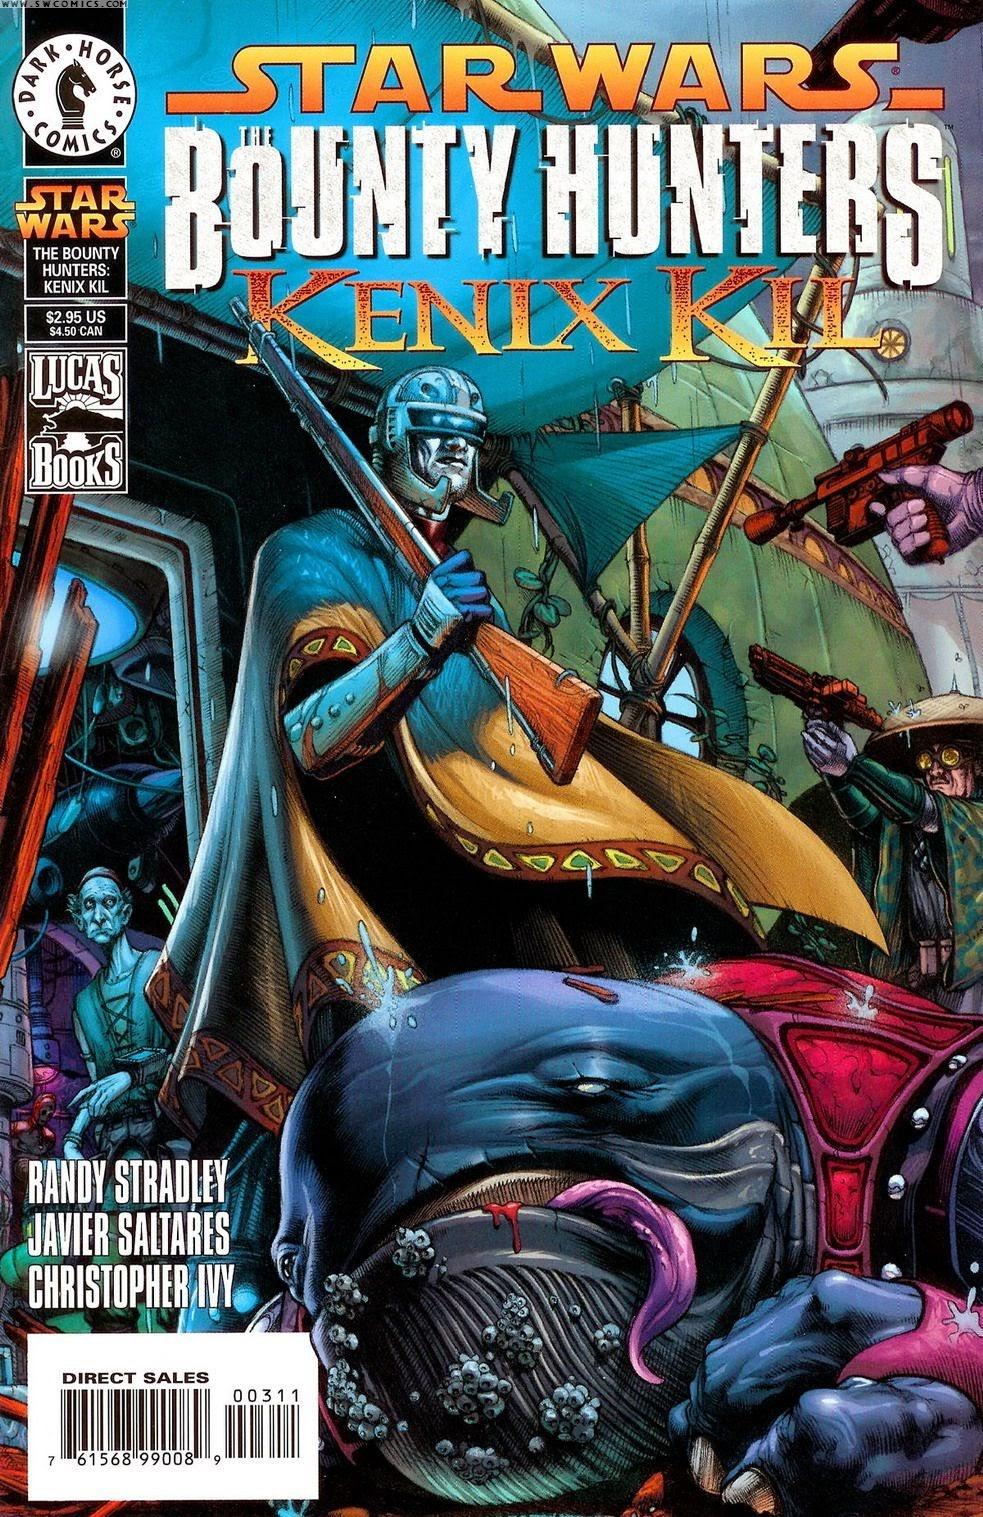 Star Wars: The Bounty Hunters issue Issue_Kenix_Kil - Page 1